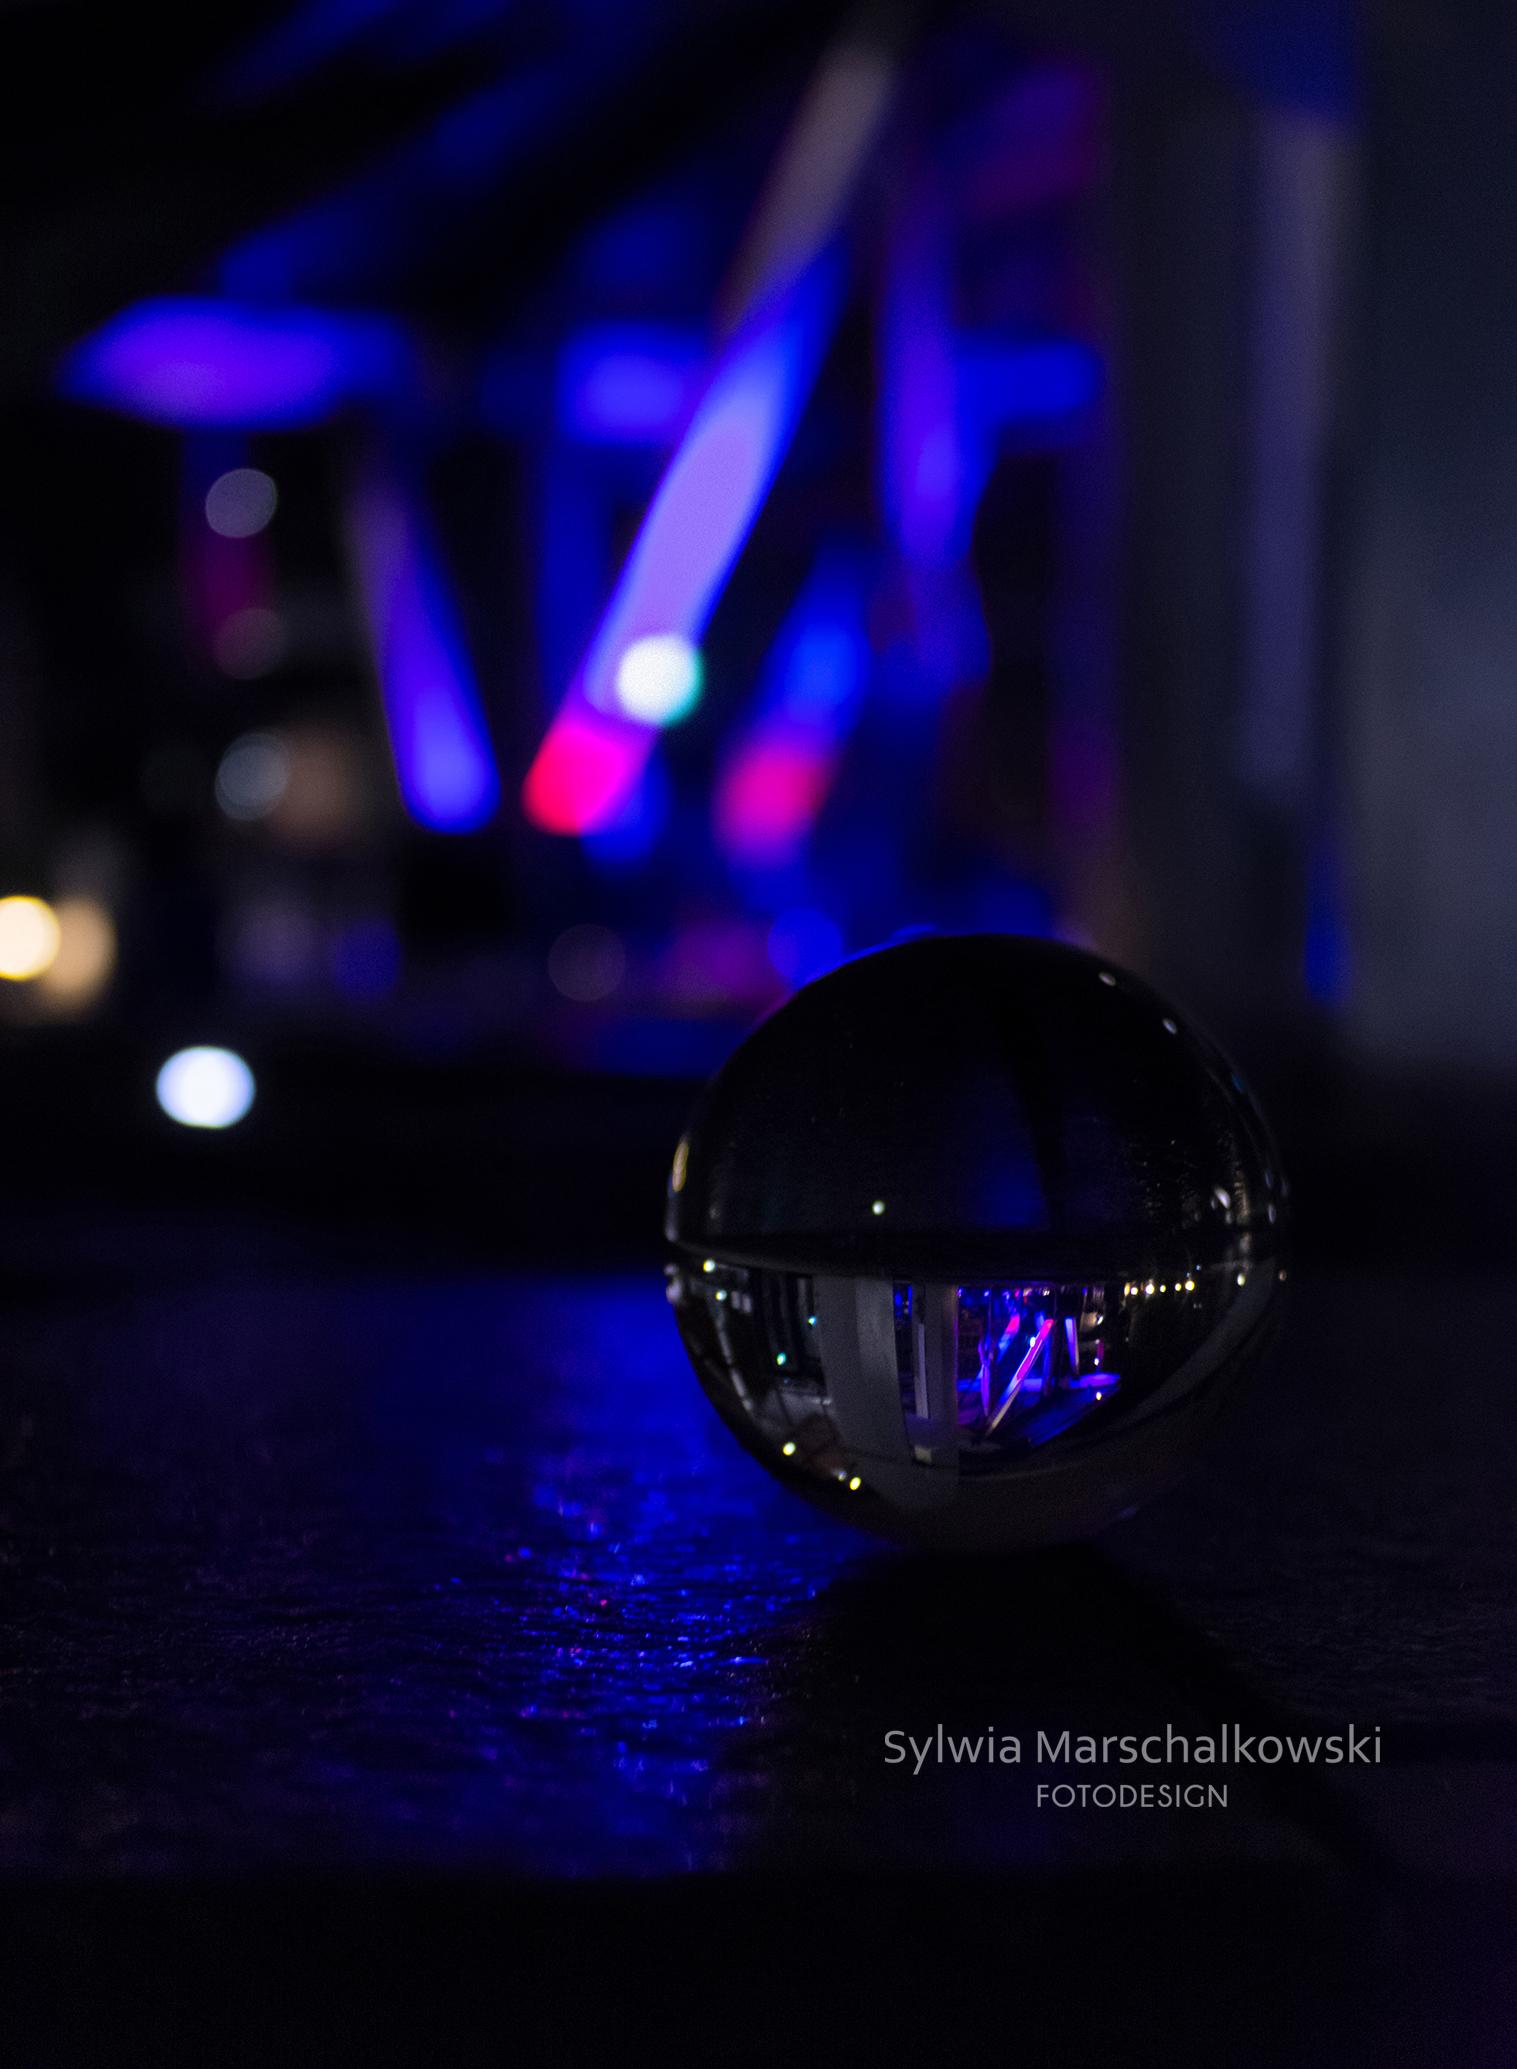 #münster #lensball #stadtbücherei